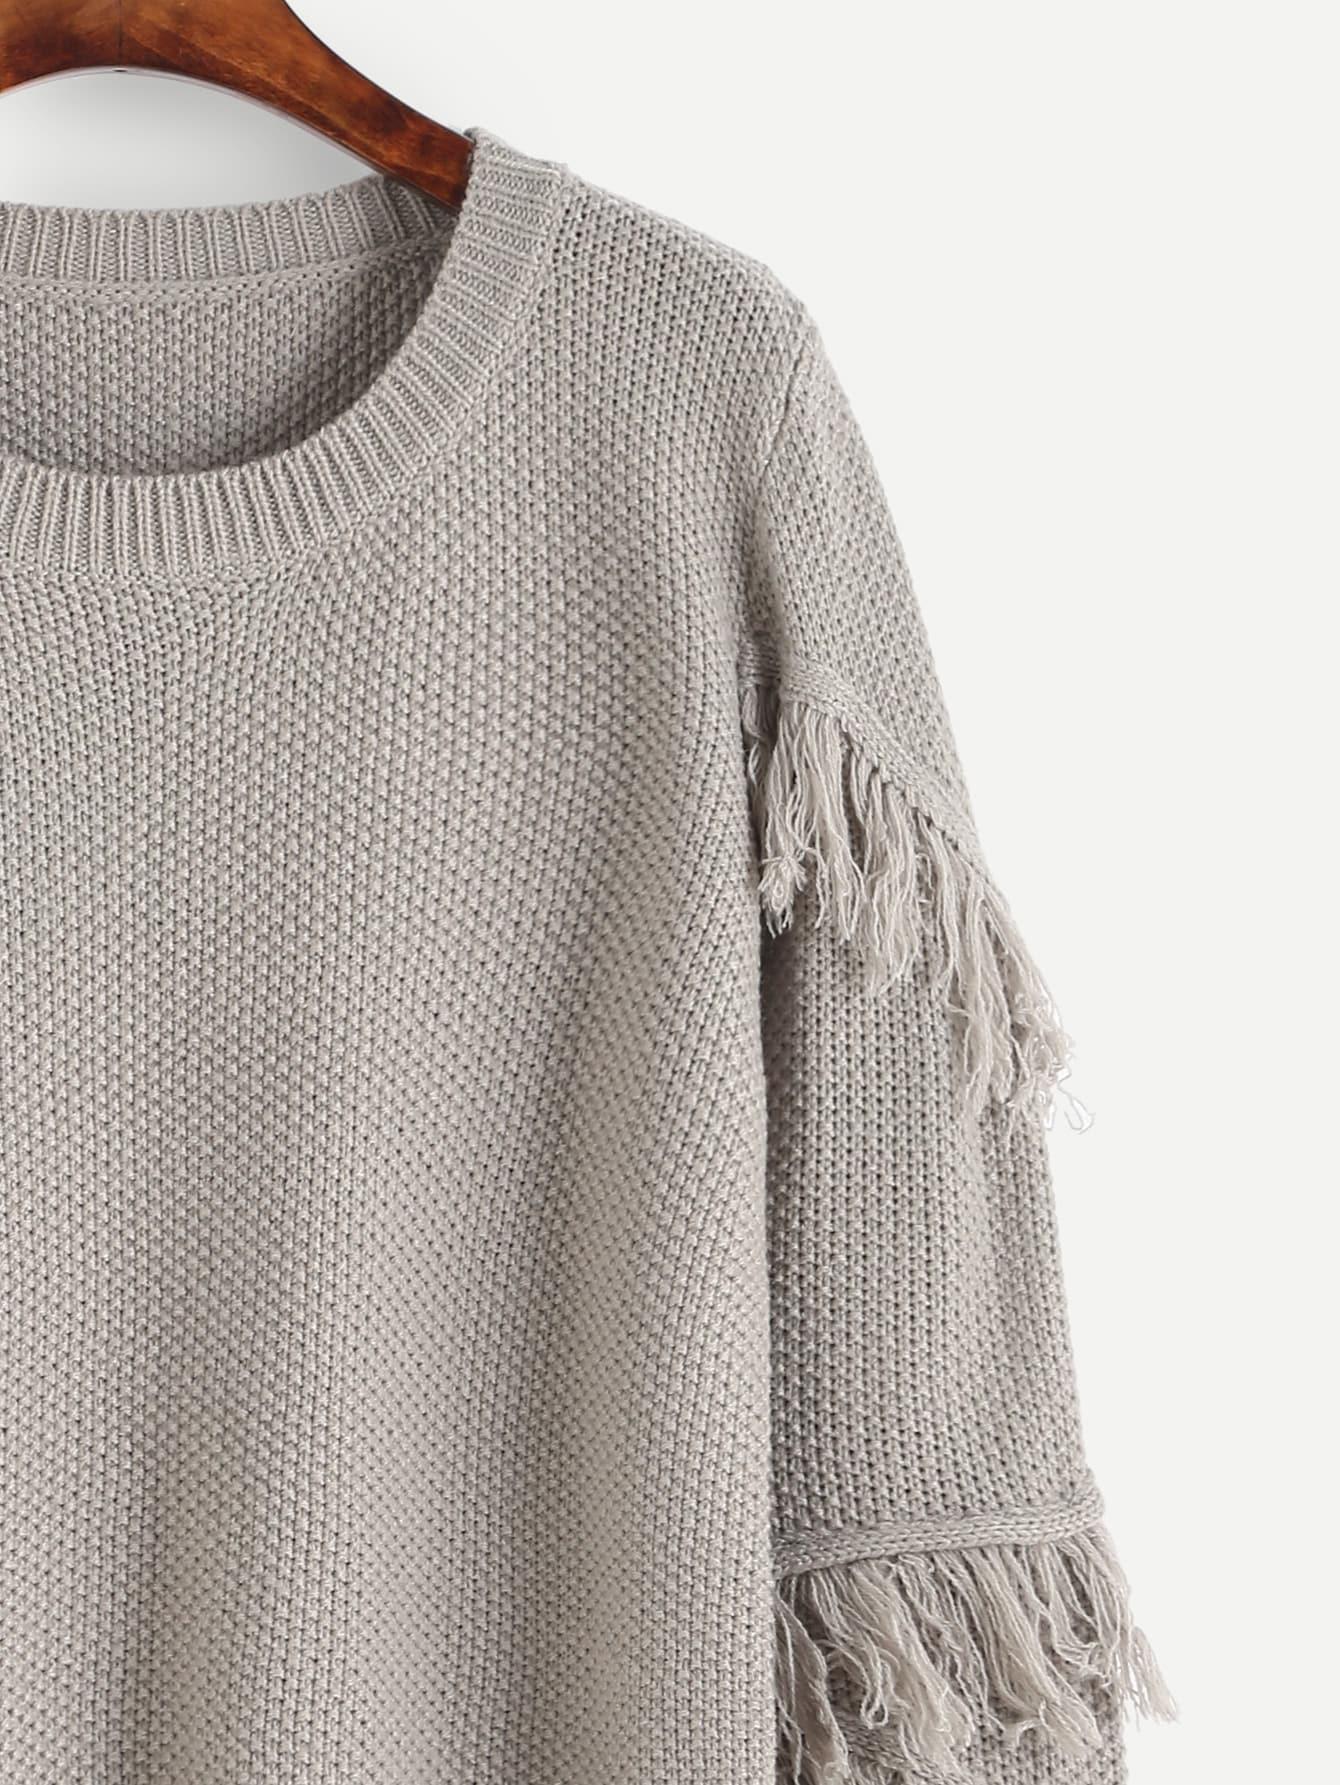 sweater160920453_2